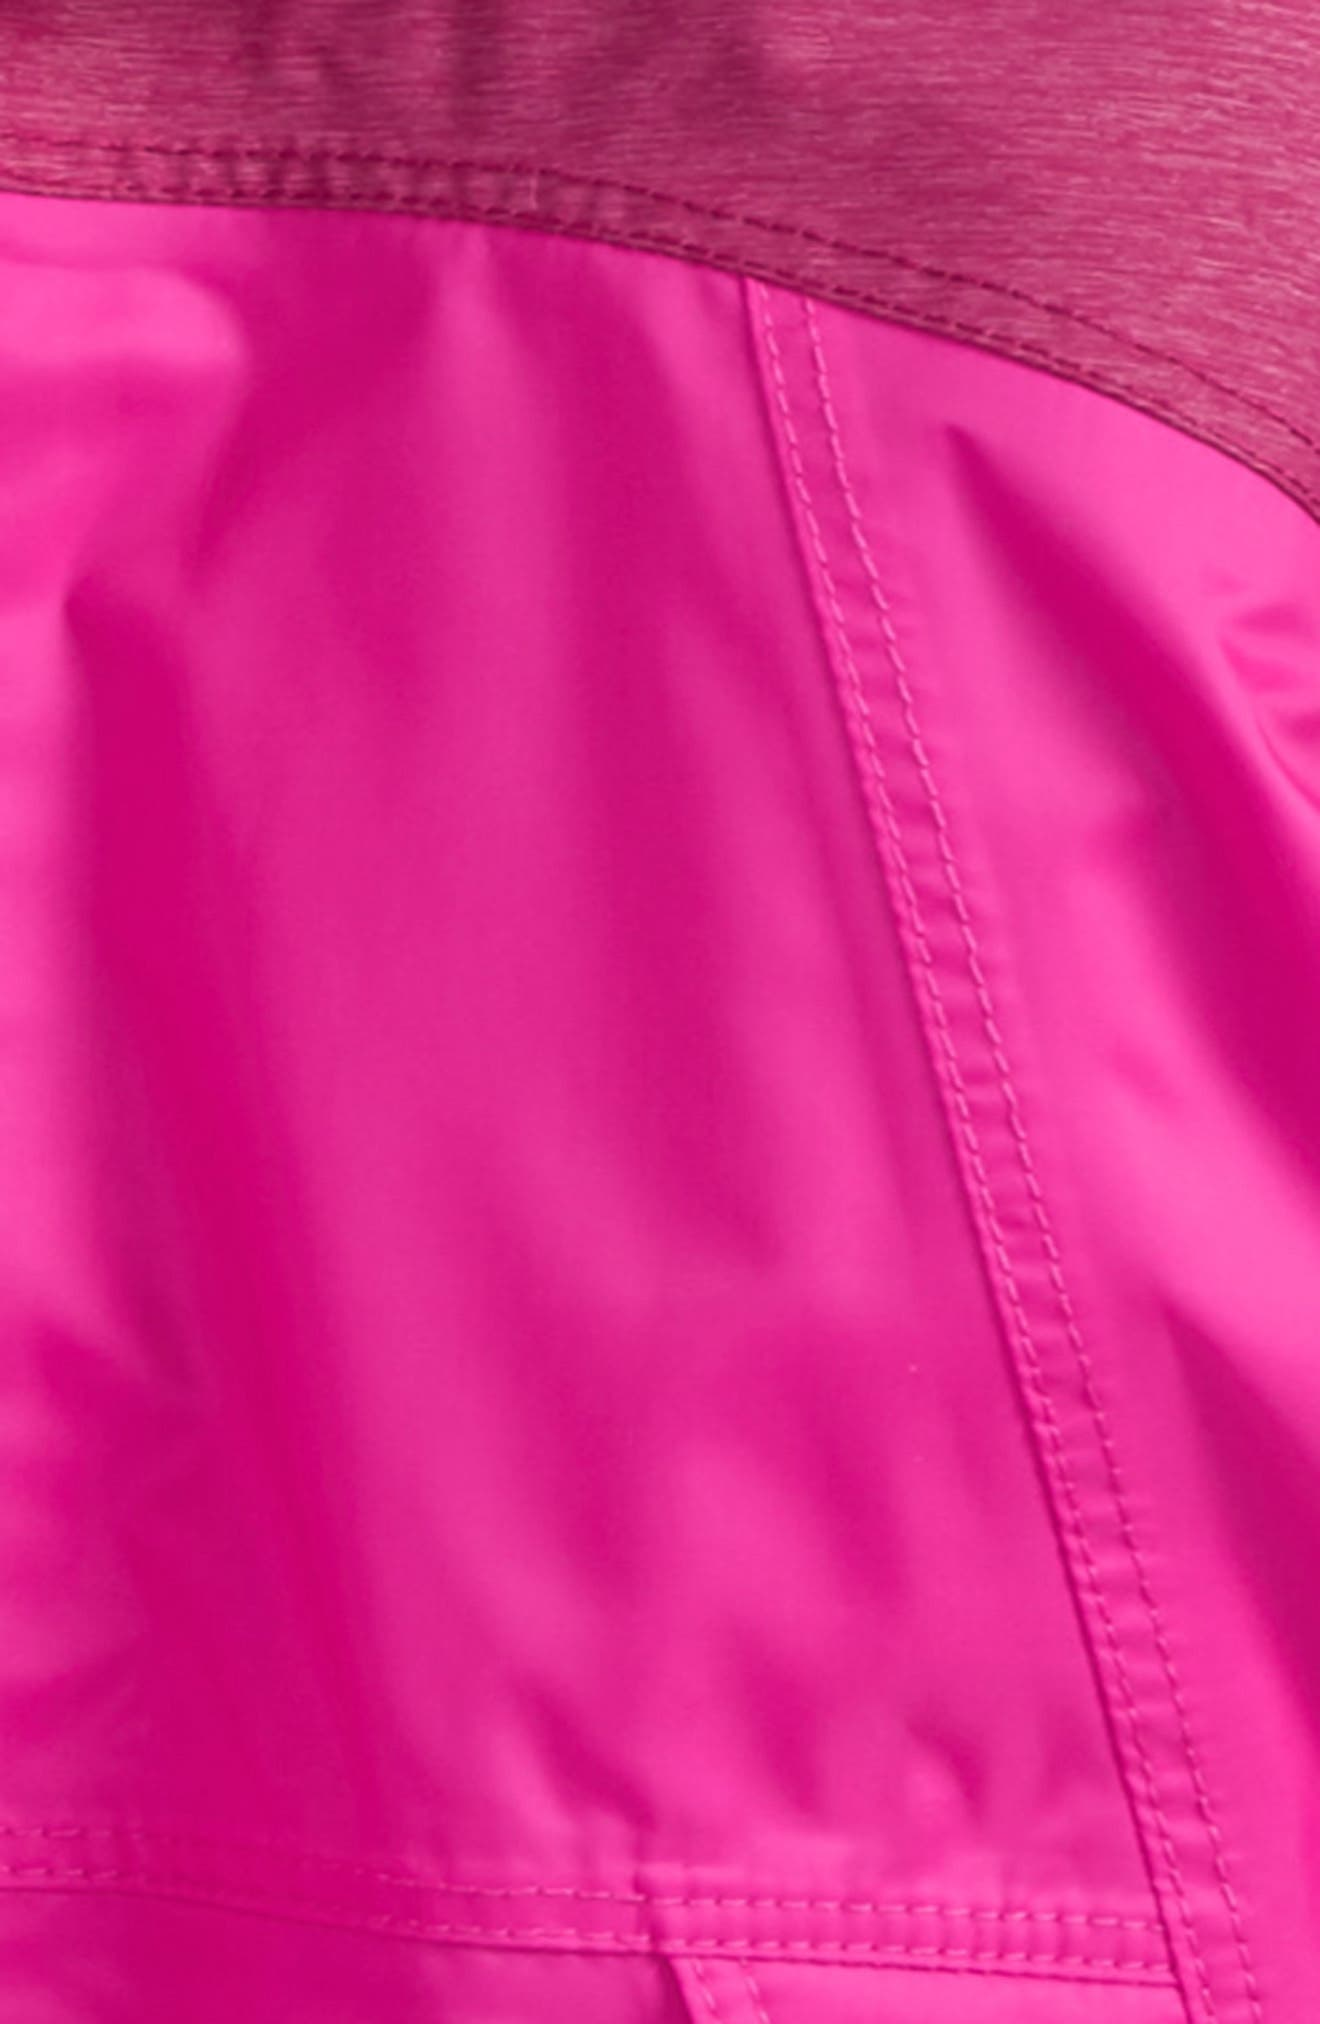 Warm Storm Waterproof Jacket,                             Alternate thumbnail 2, color,                             DRAMATIC PLUM HEATHER